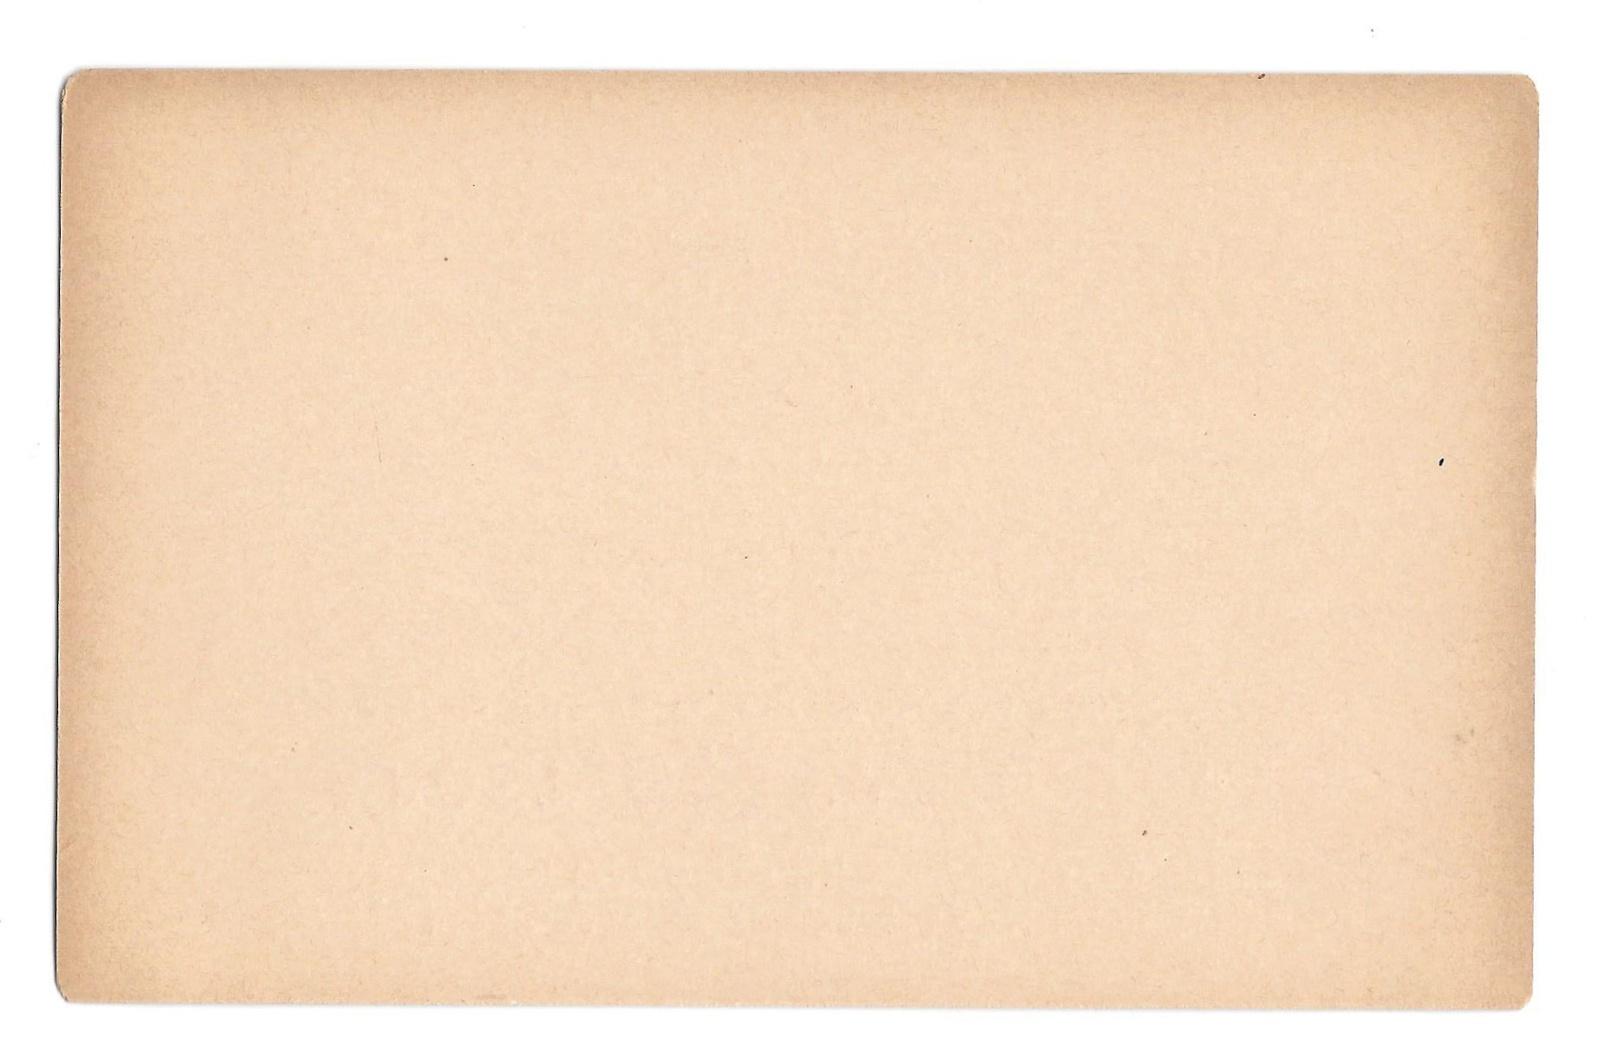 British Seychelles 1890 QV 4c and 8c 2 UPU Postal Stationery Card image 5